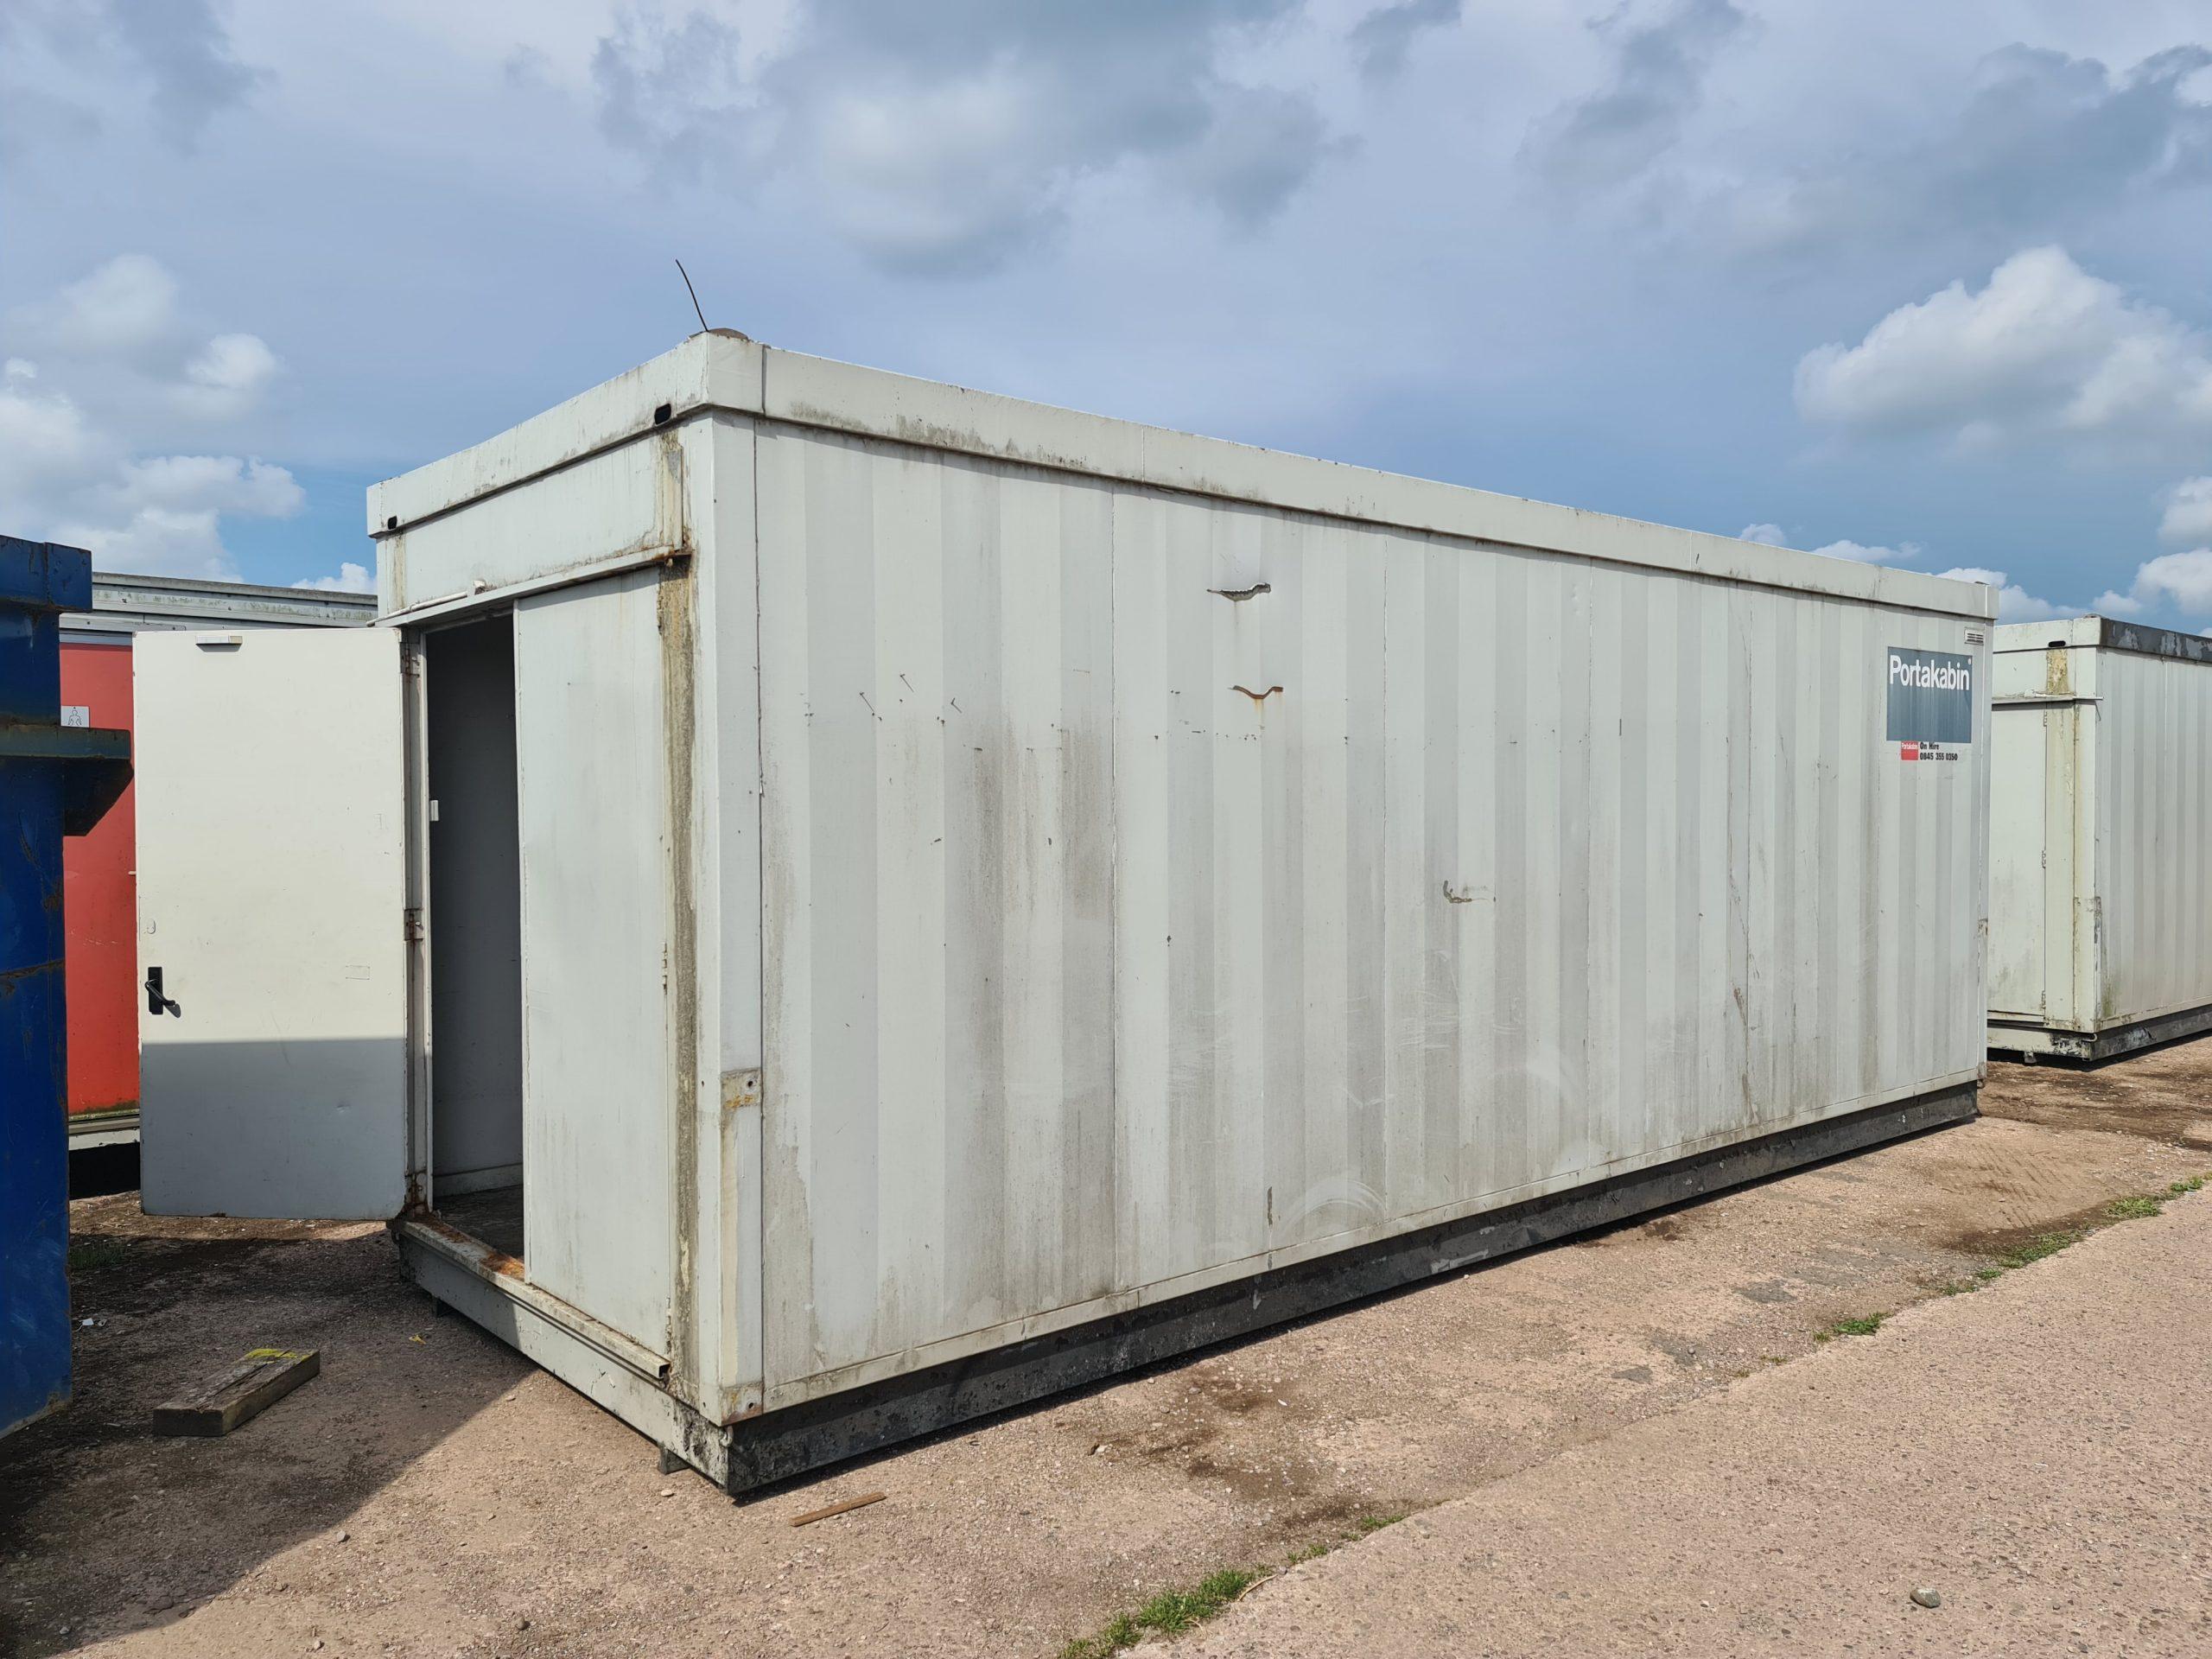 24' x 9' Storage Container